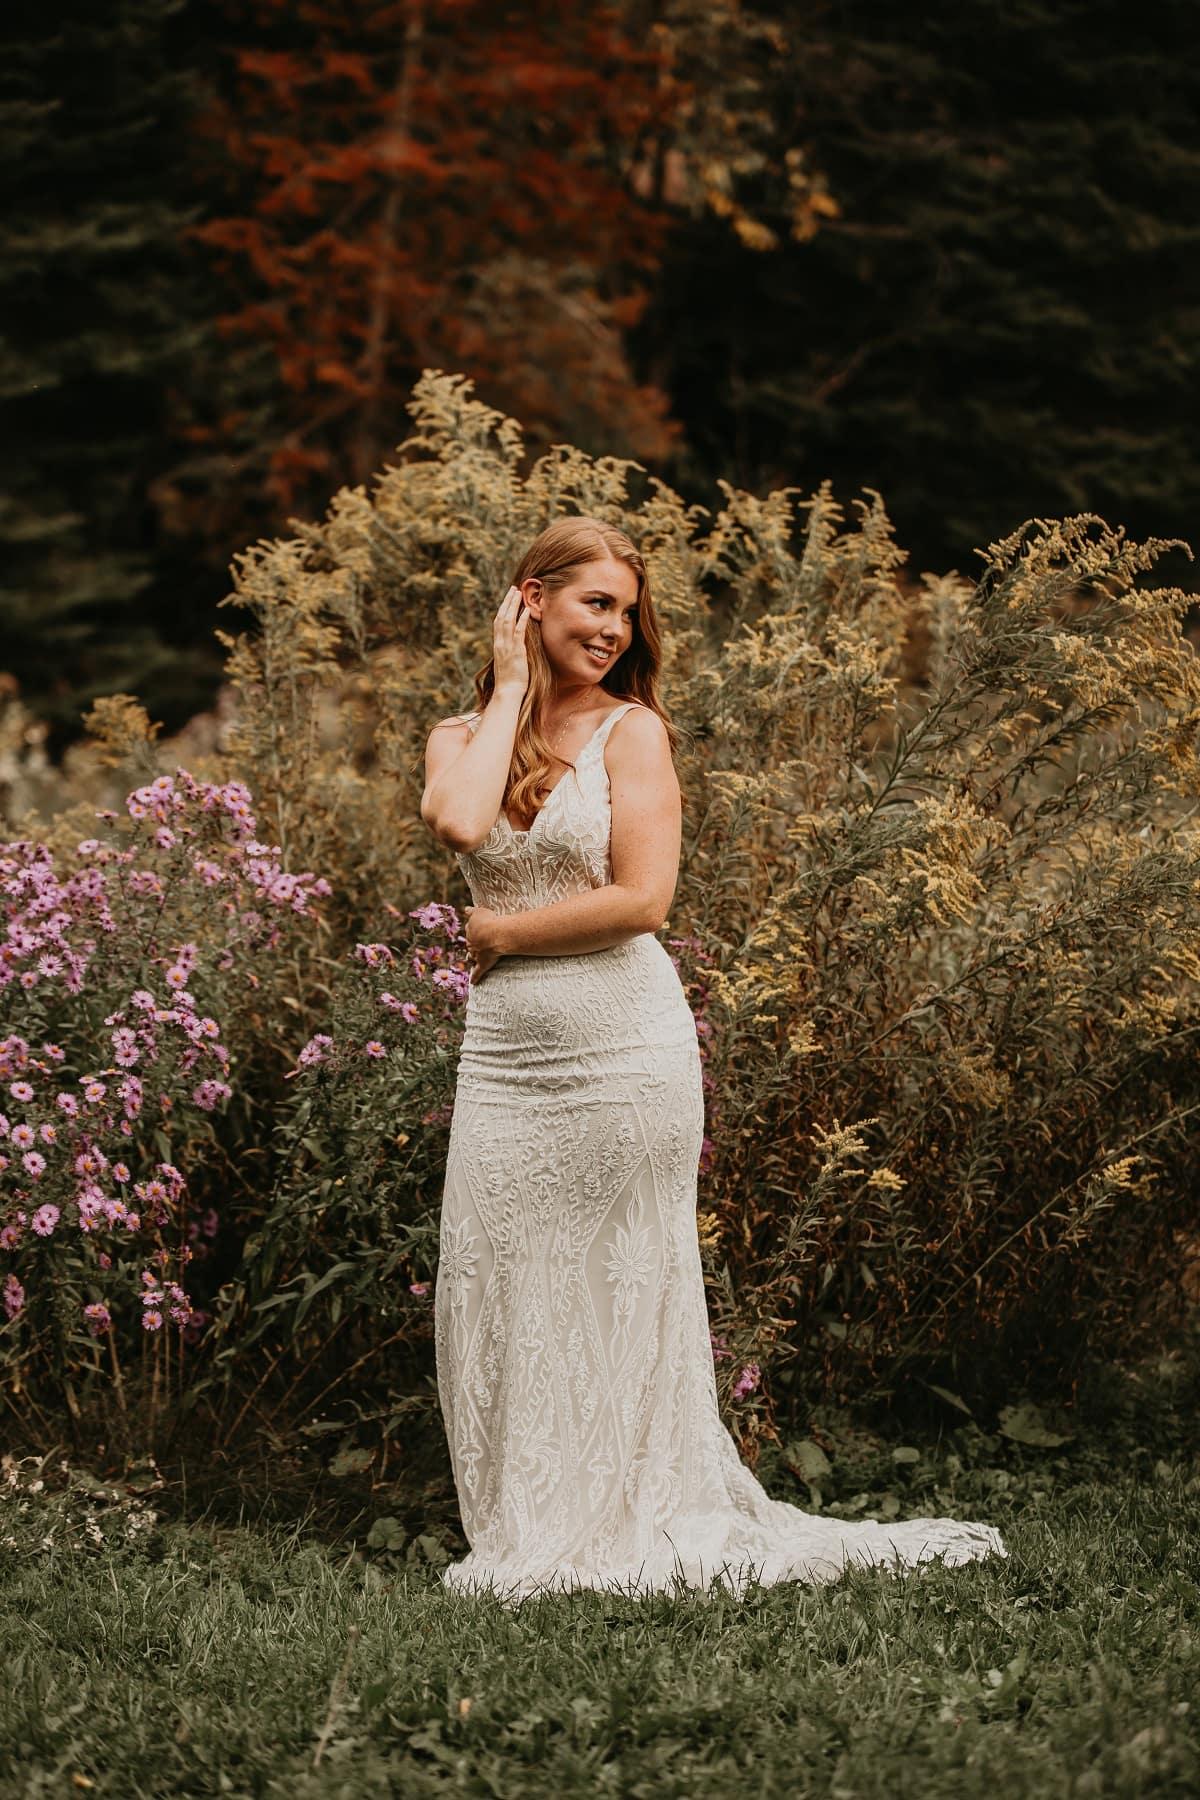 sarah-martin-photo-autumn-elopement-inspiration-boho-outdoor-destination-wedding-elope-micro2